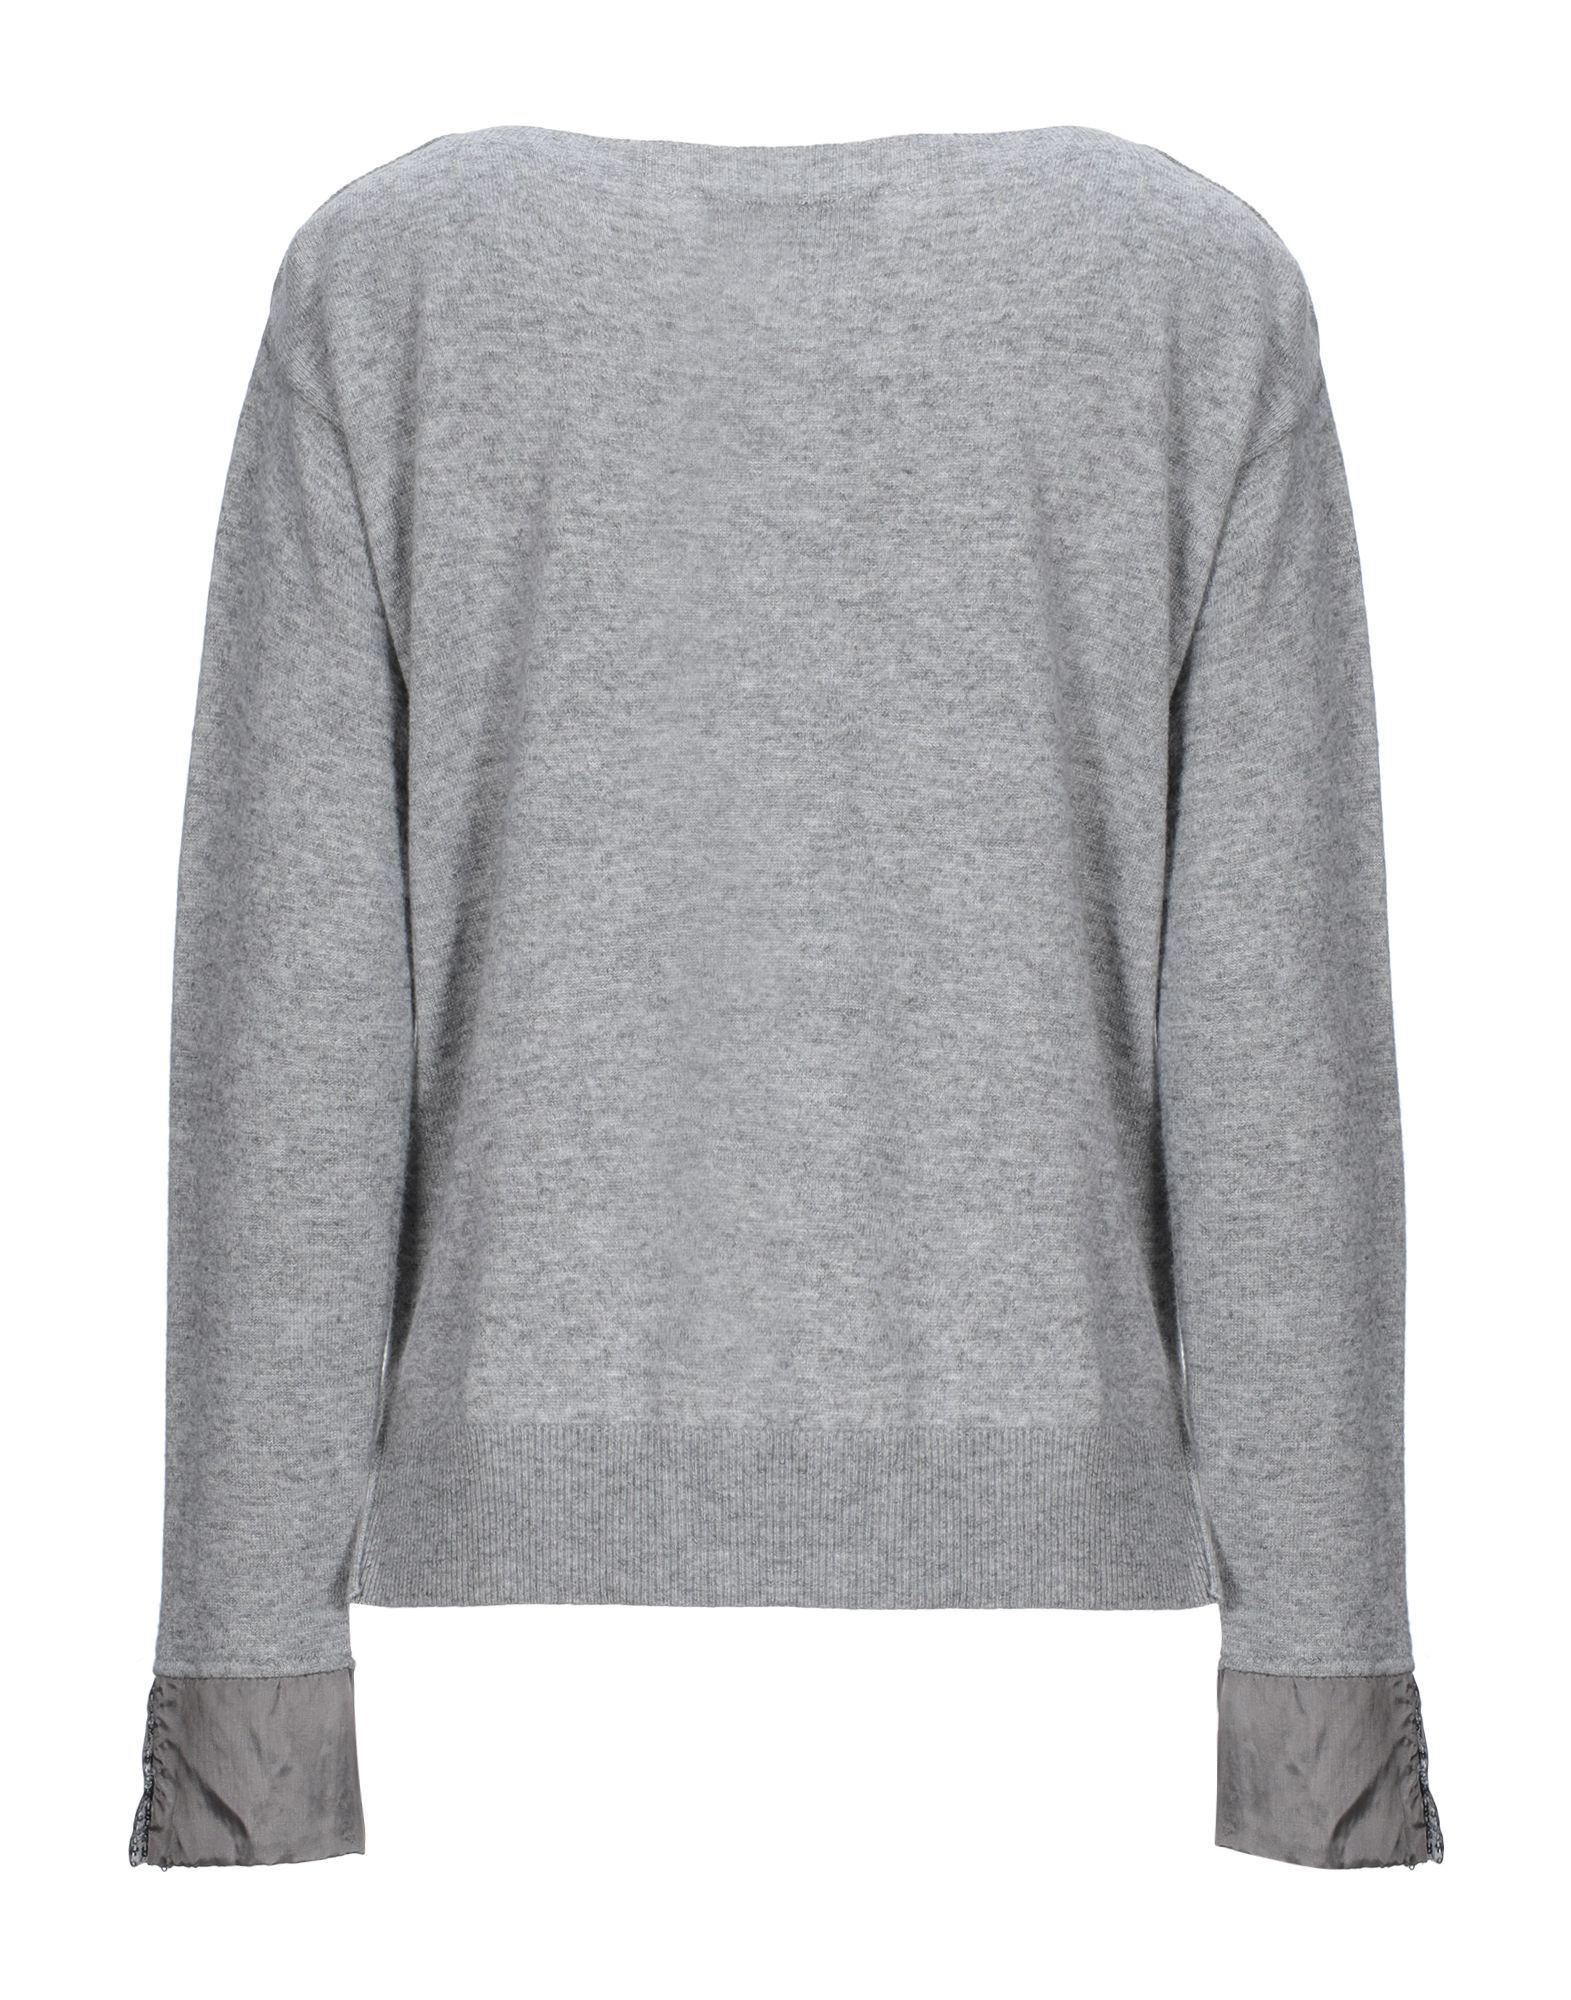 Kaos Grey Lightweight Knit Jumper With Sequins